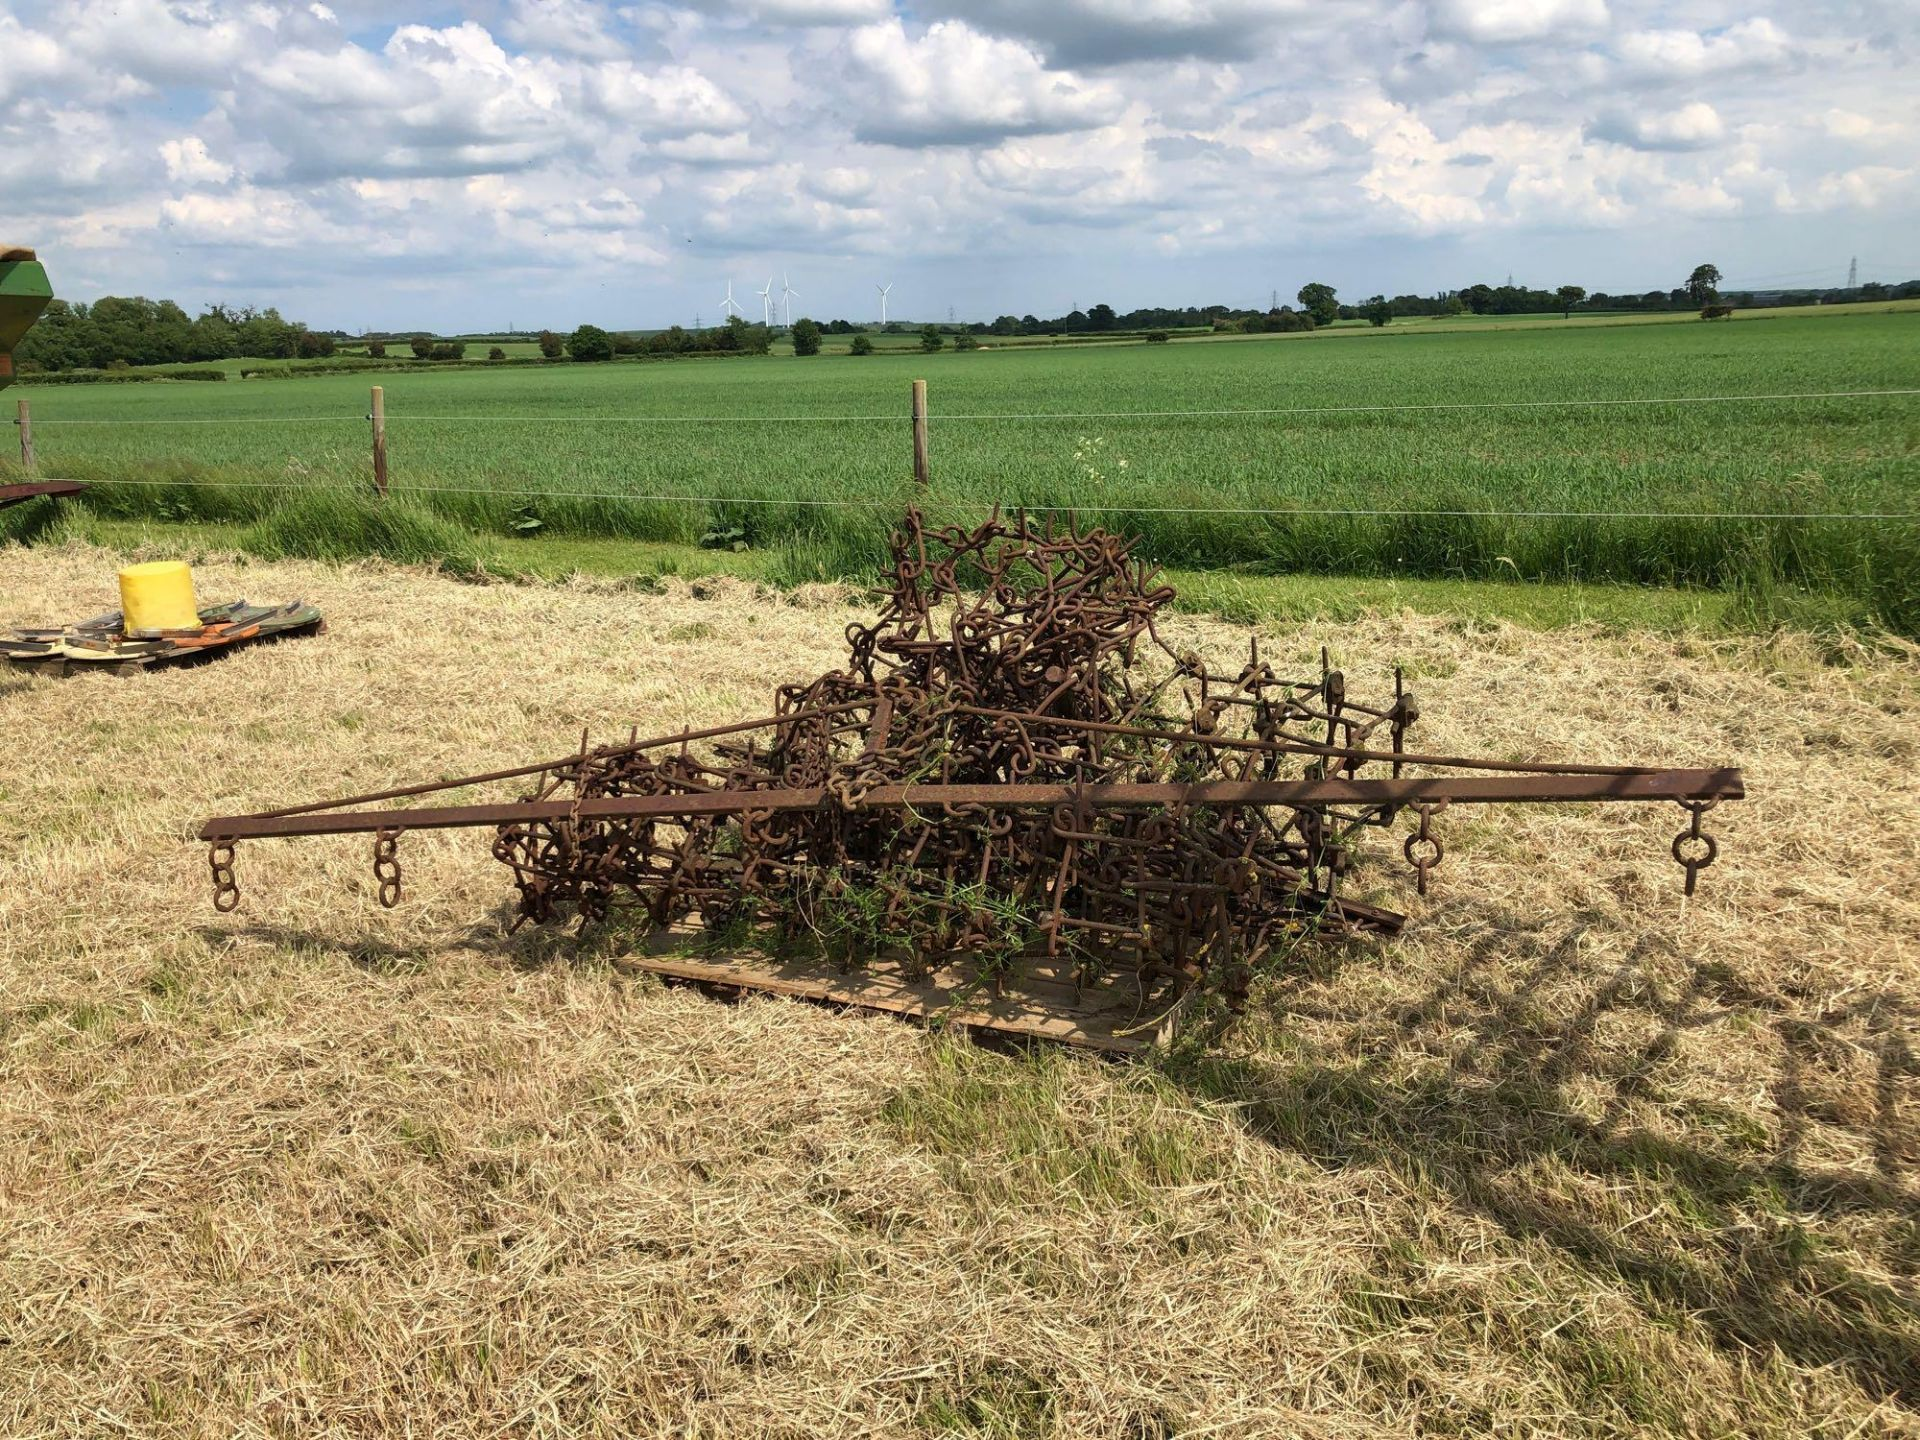 Chain harrows - Image 2 of 2